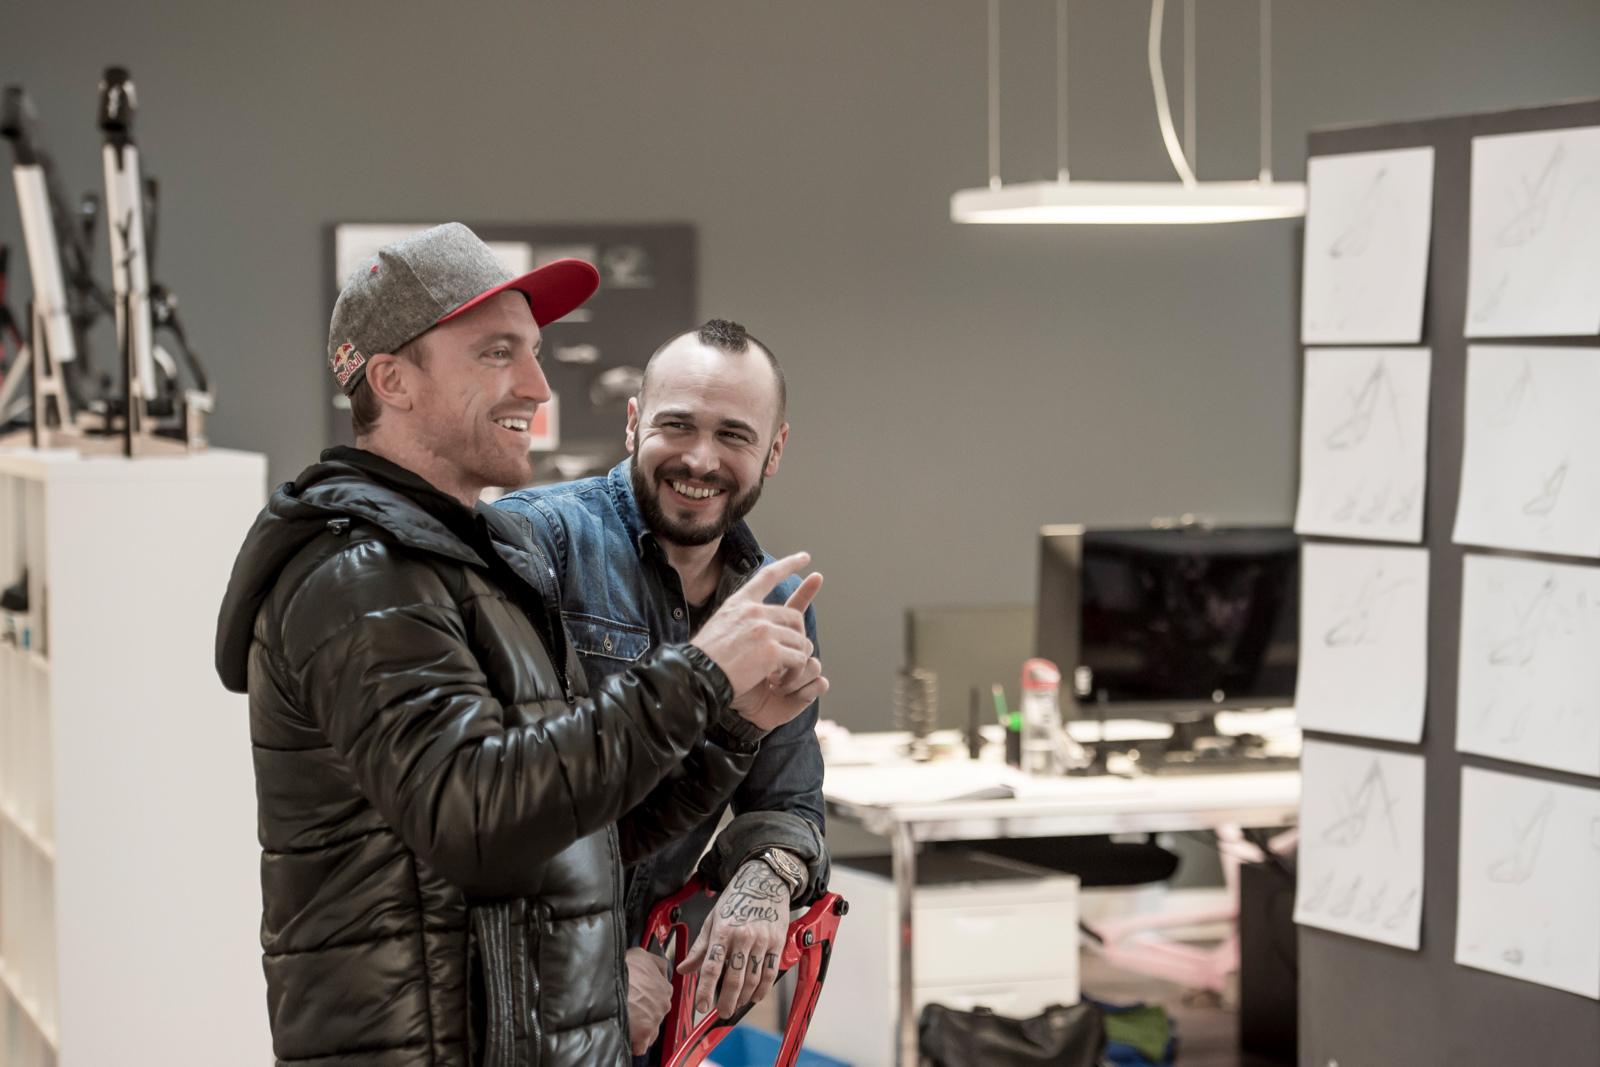 YT s Markus Flossman on Signing Aaron Gwin